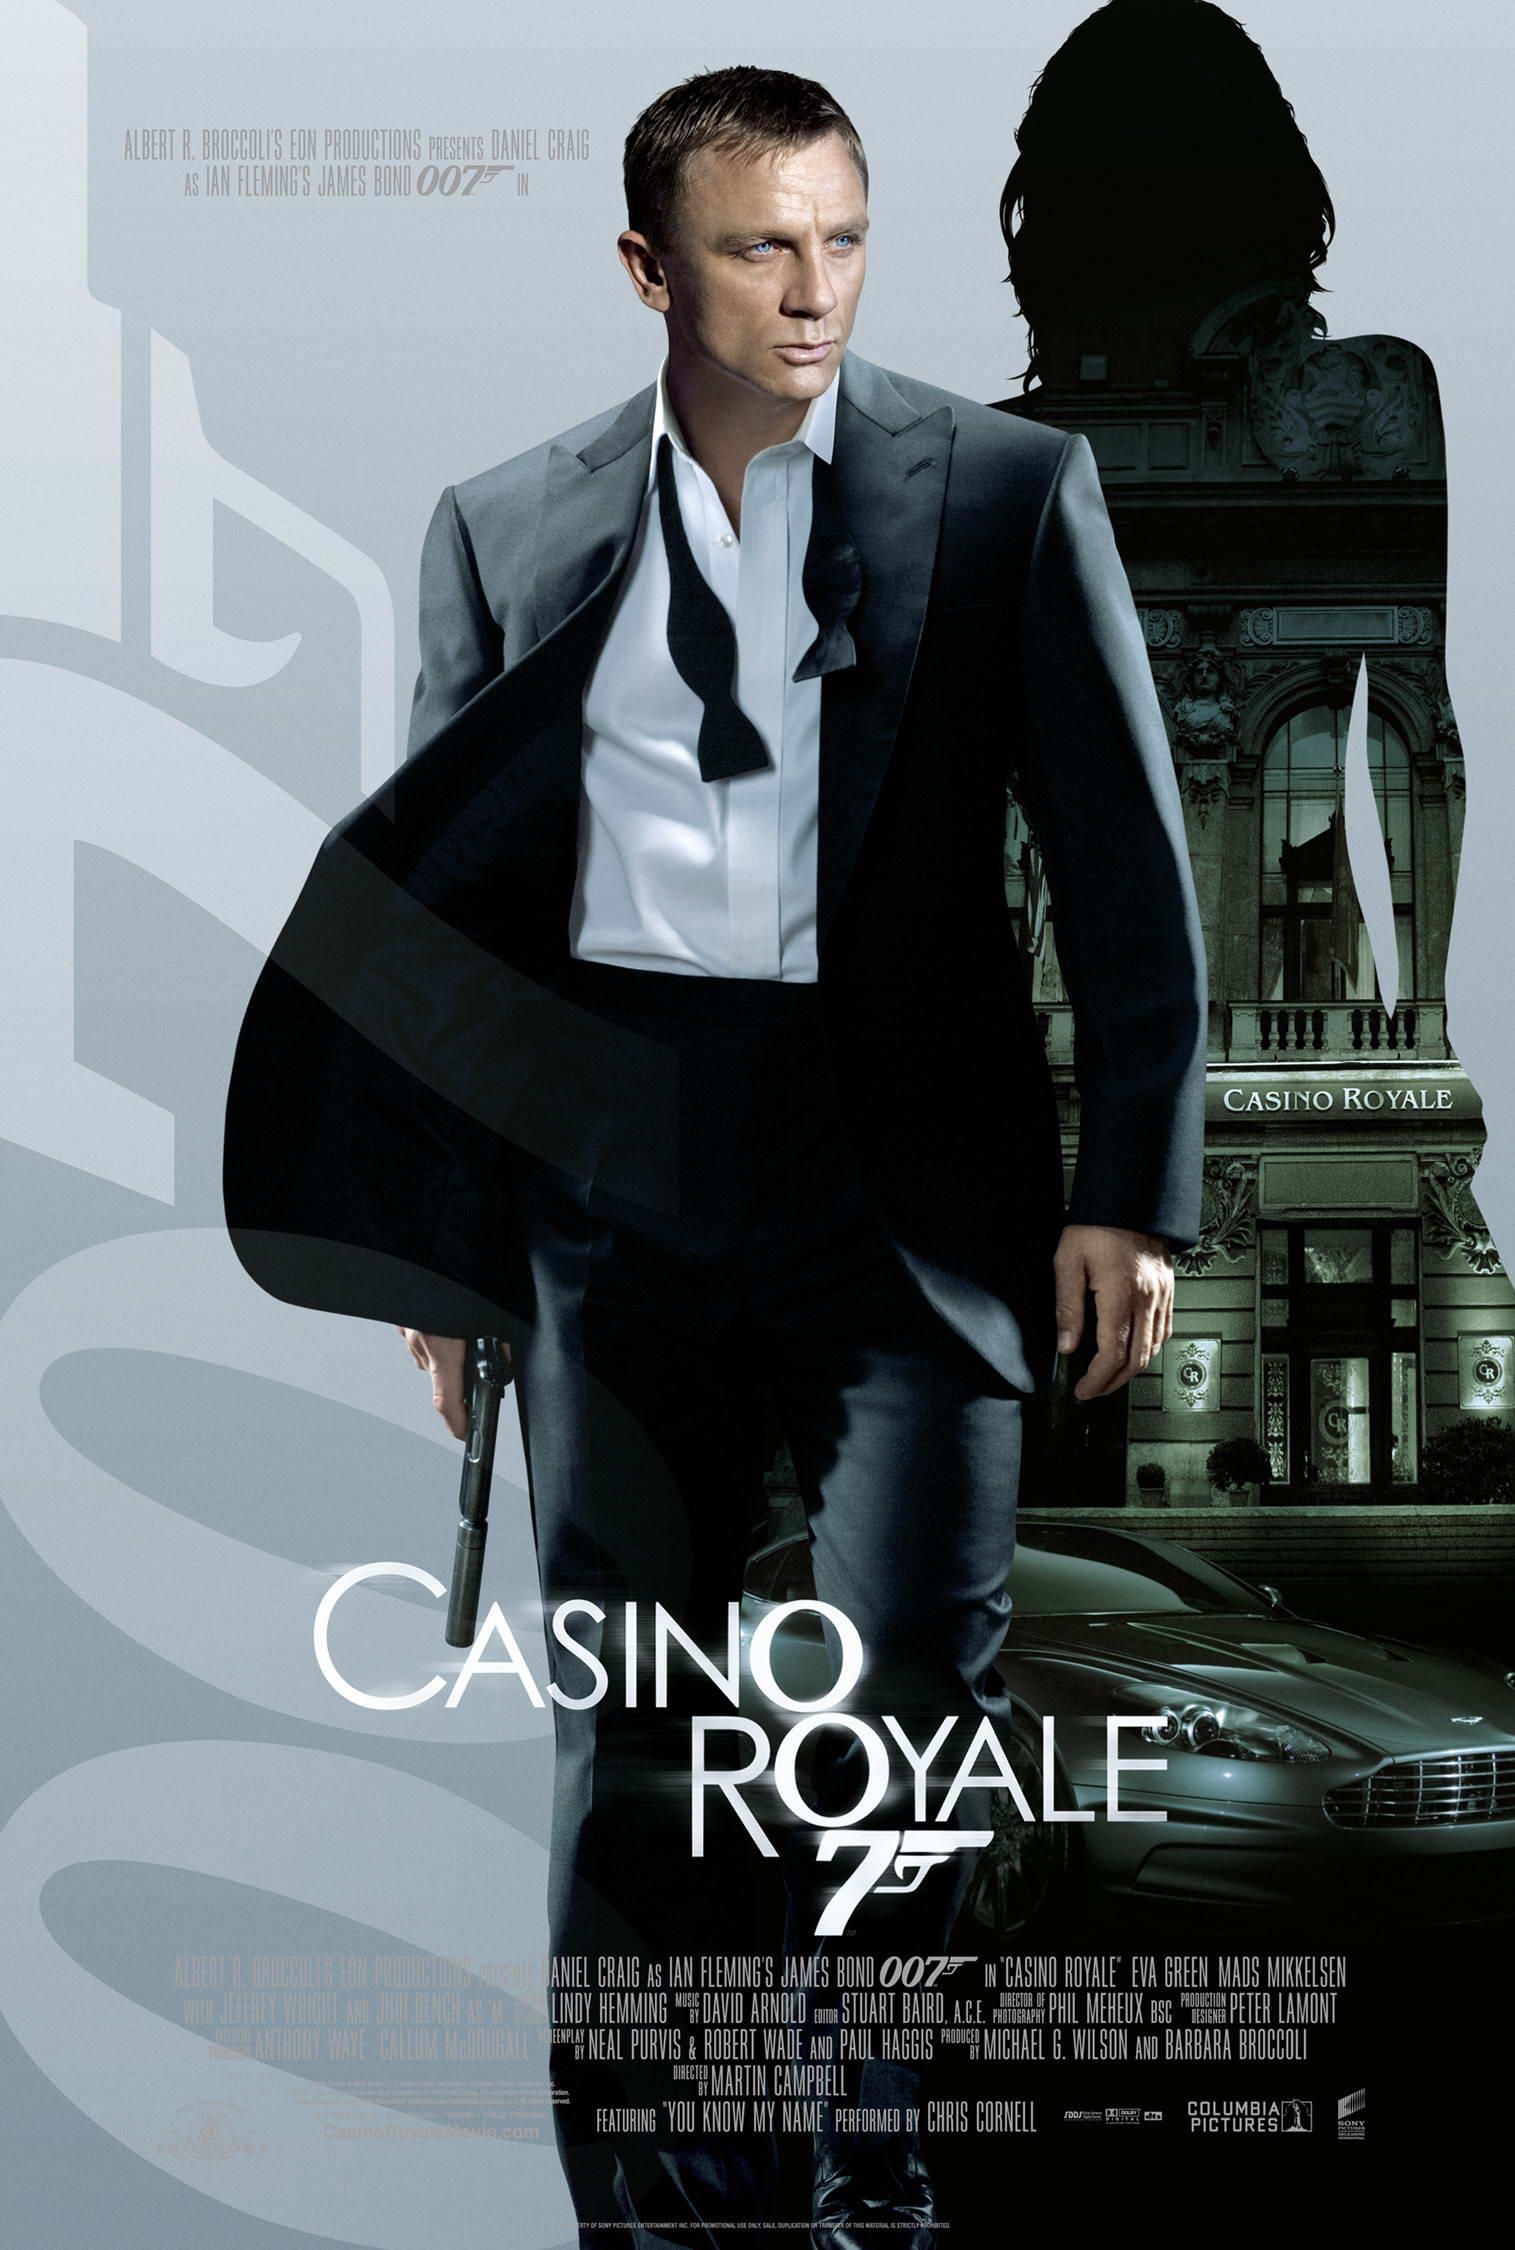 Bond in the upcoming bond movie titled casino royale blog casino download fairbiz.biz fairbiz.biz fairbiz.biz free software software